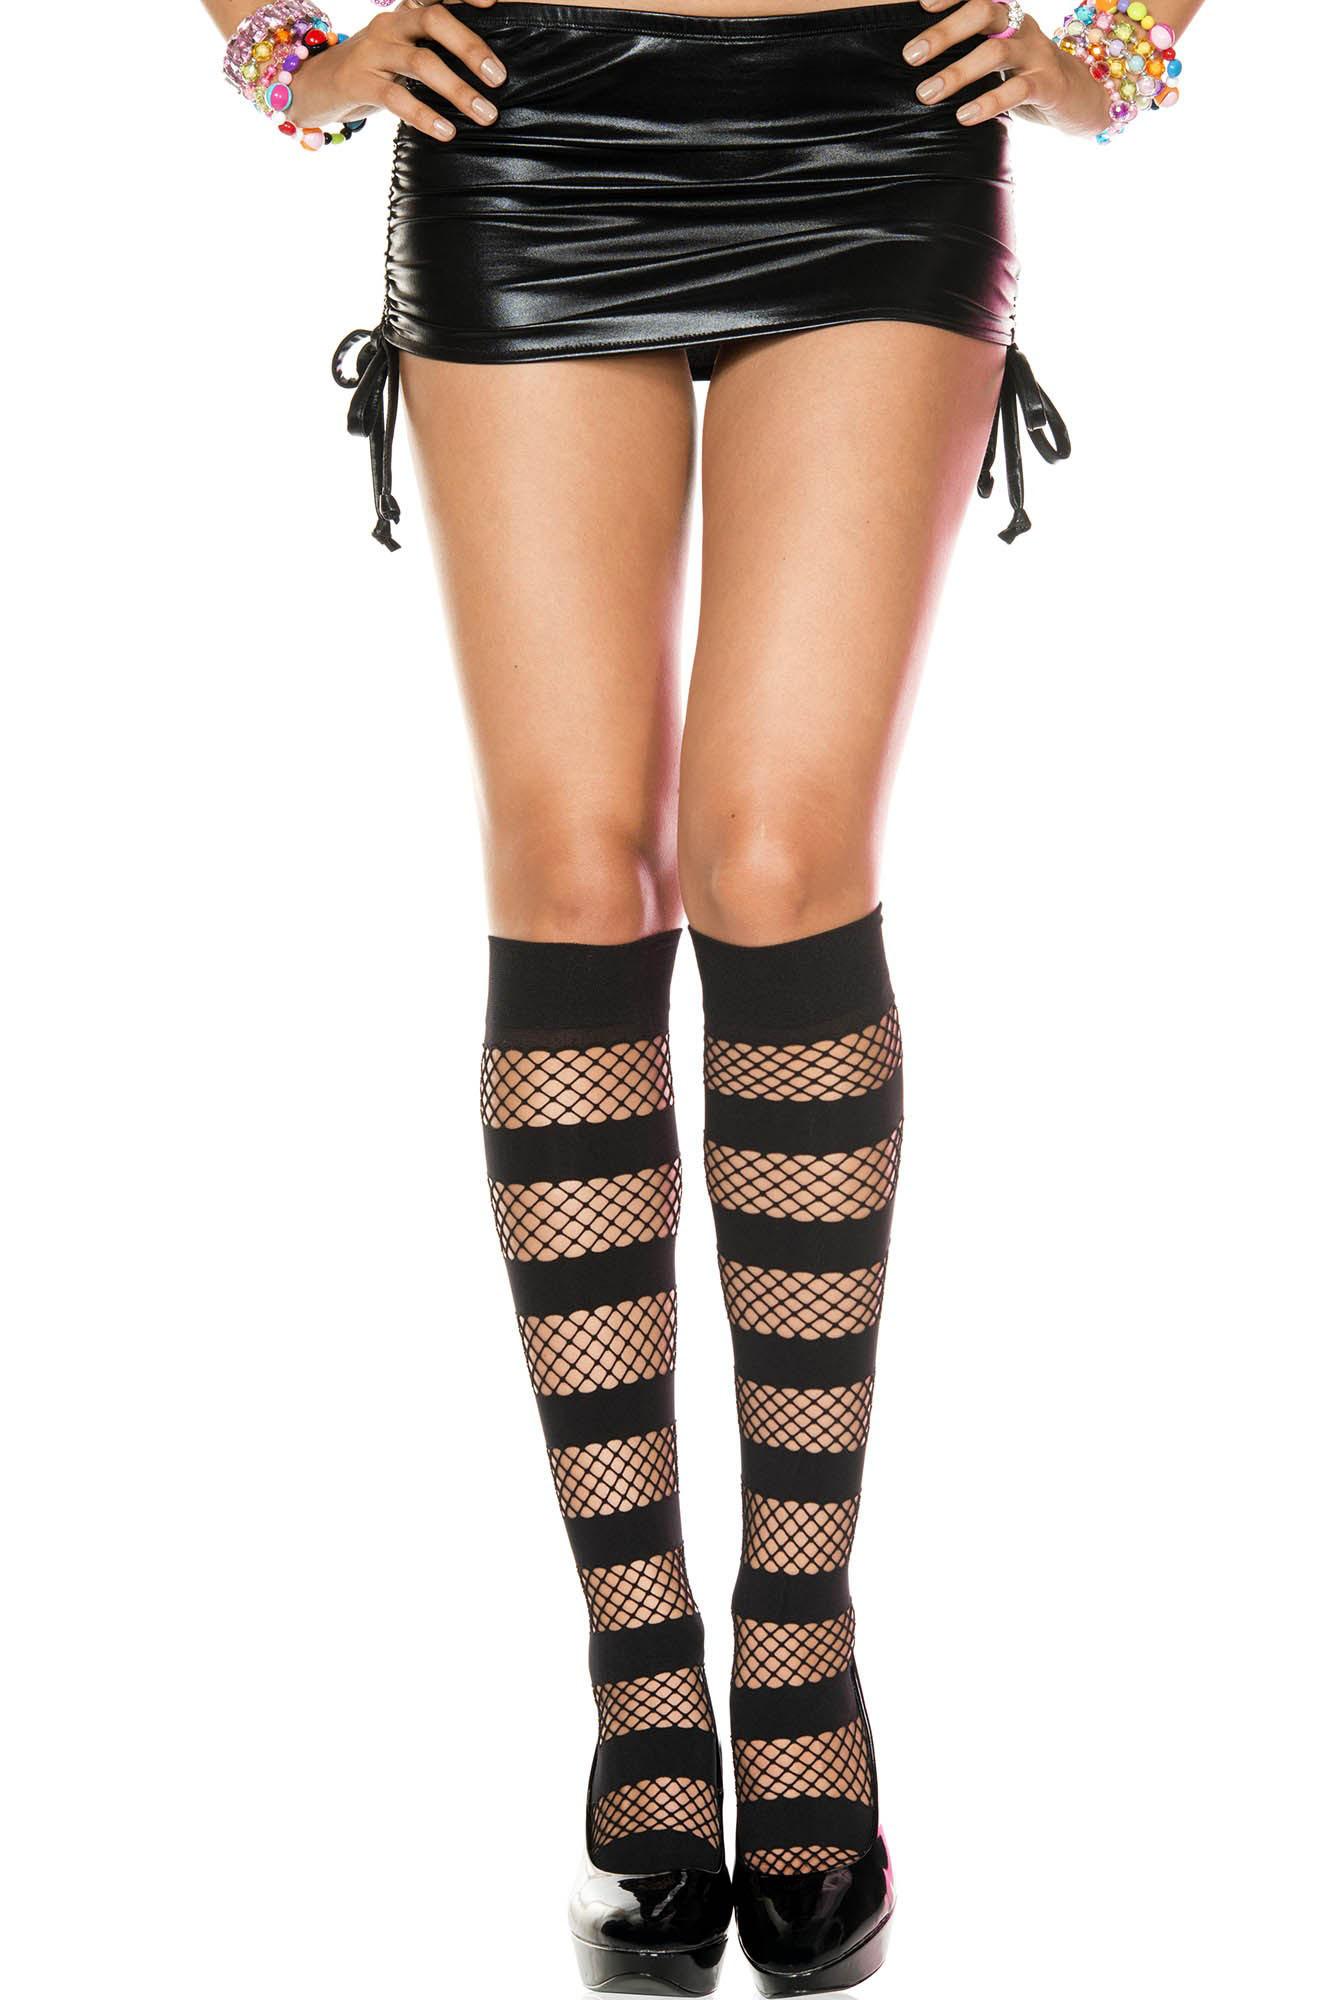 88500e2be6b458 Striped Diamond Fishnet Knee Socks- Black